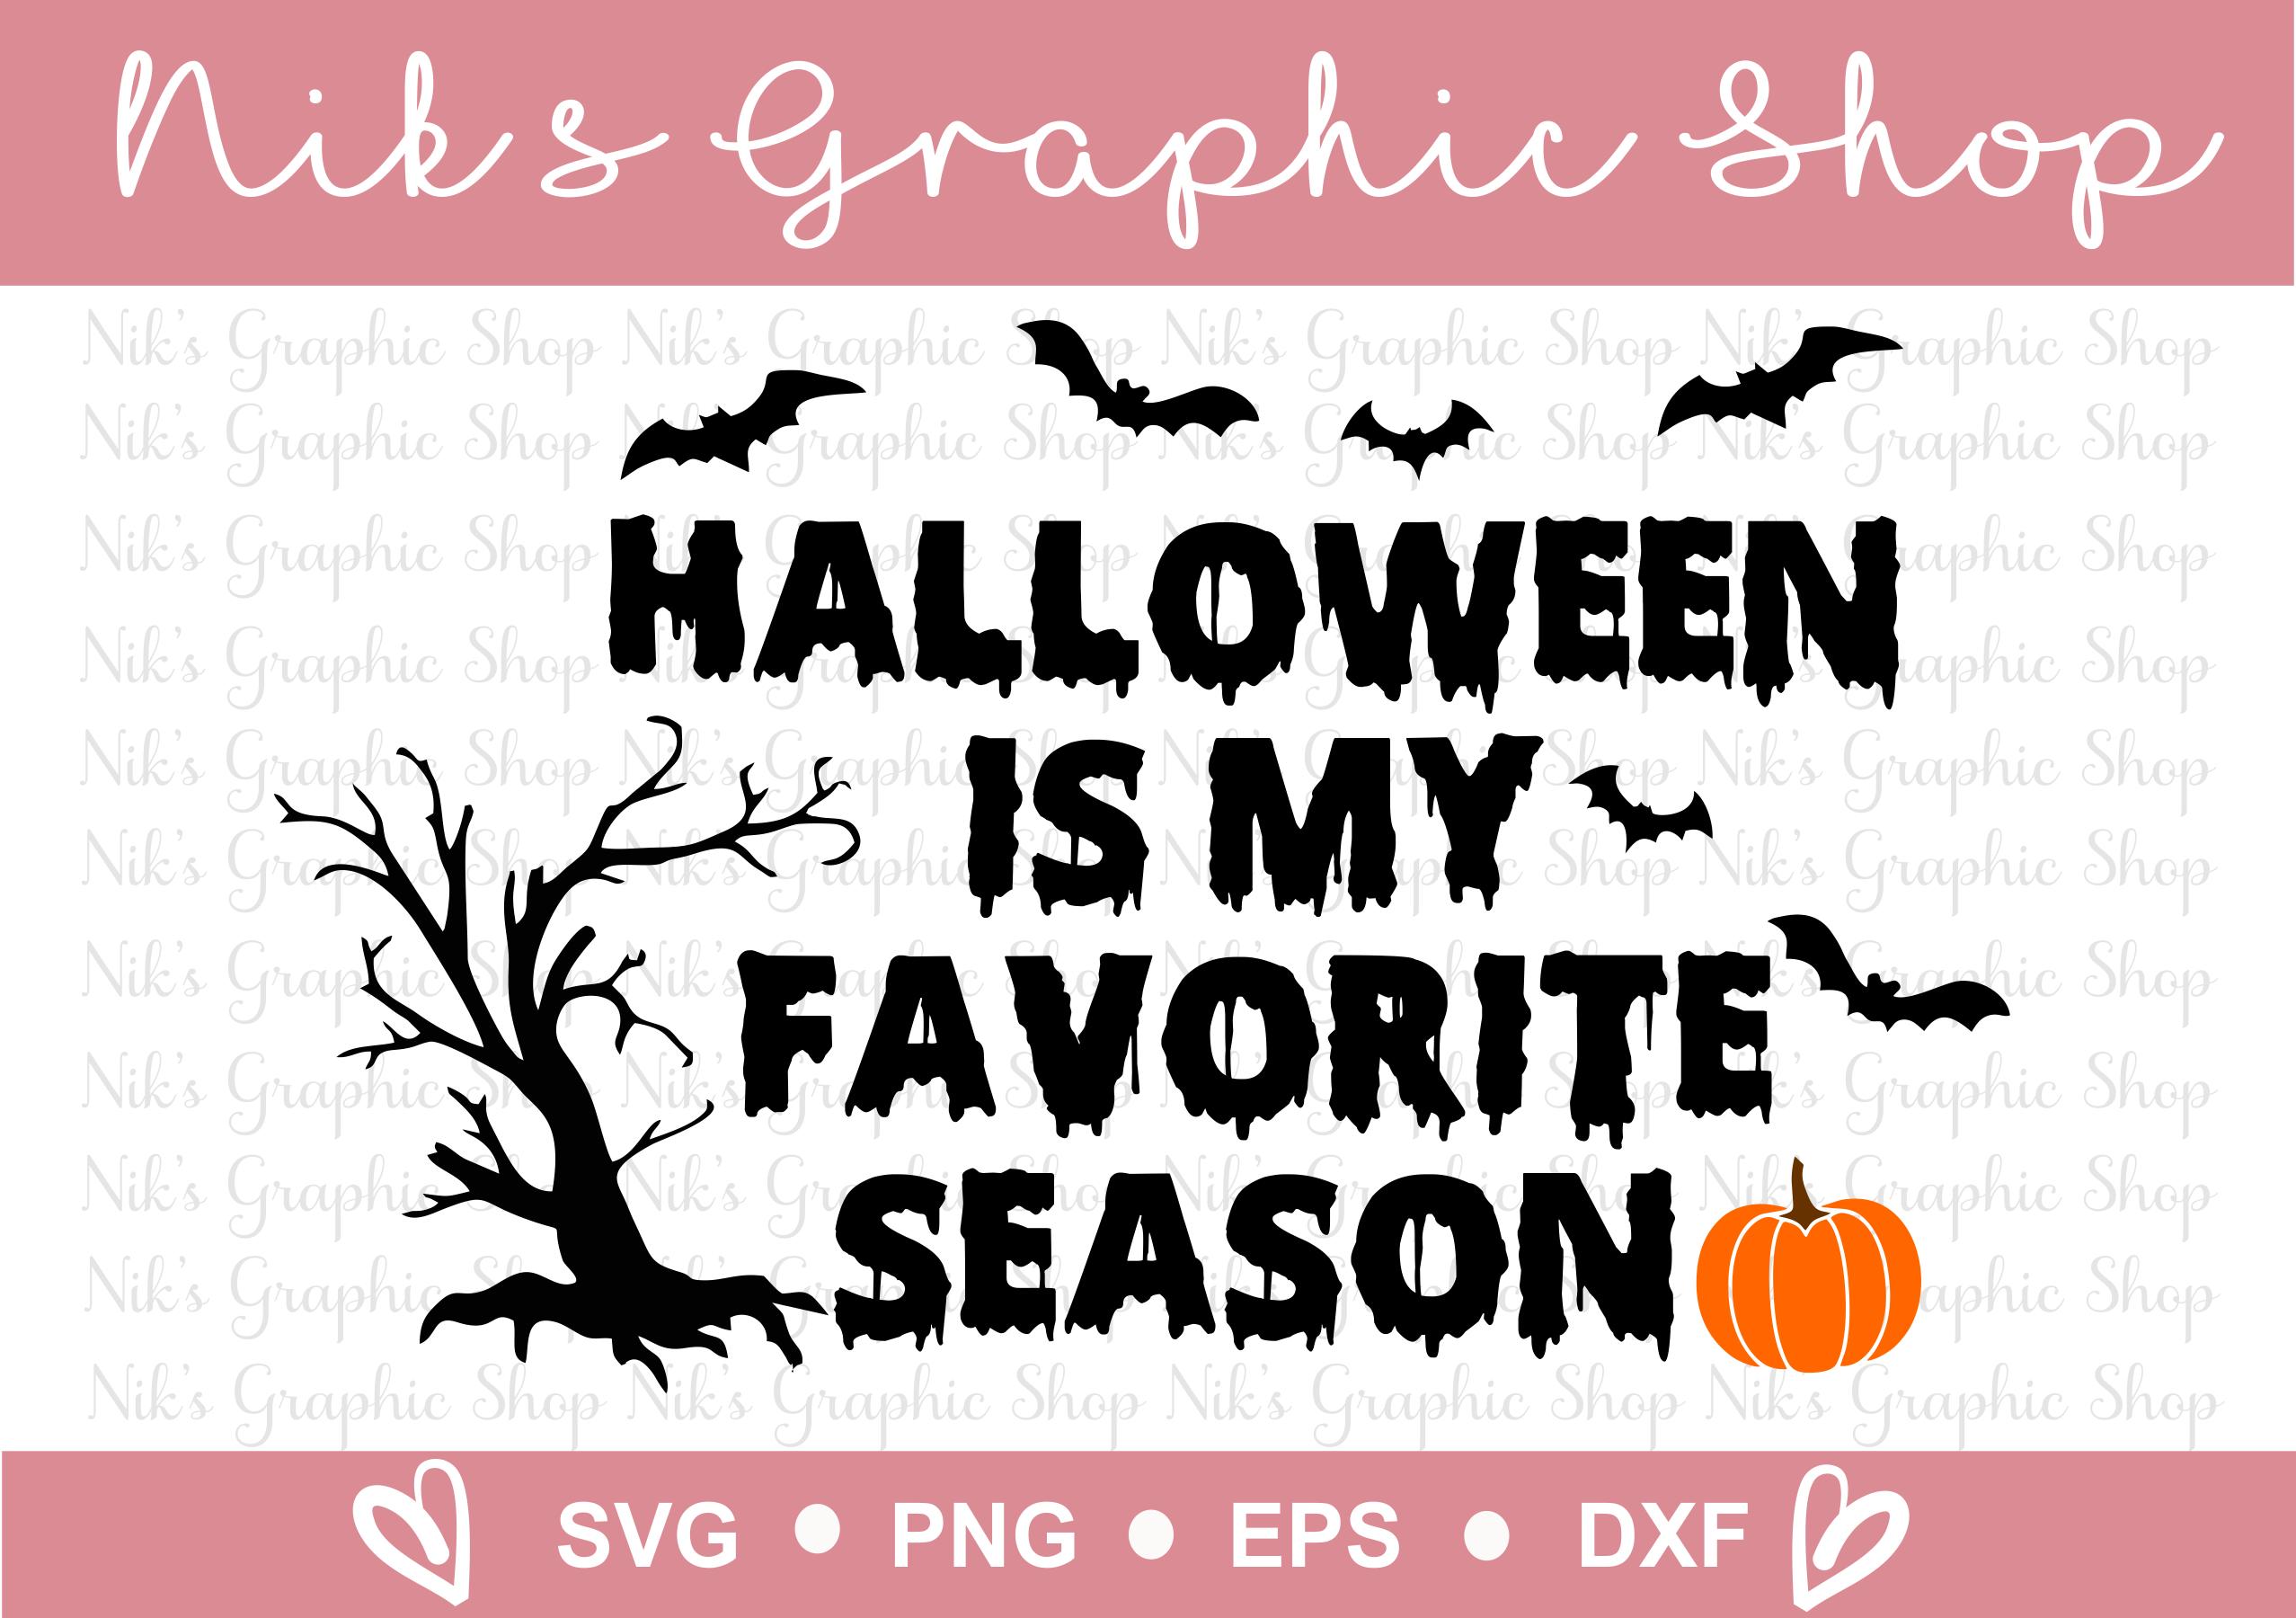 Halloween SVG, Witch SVG, Ghost SVG, Halloween Svg Bundle example image 4